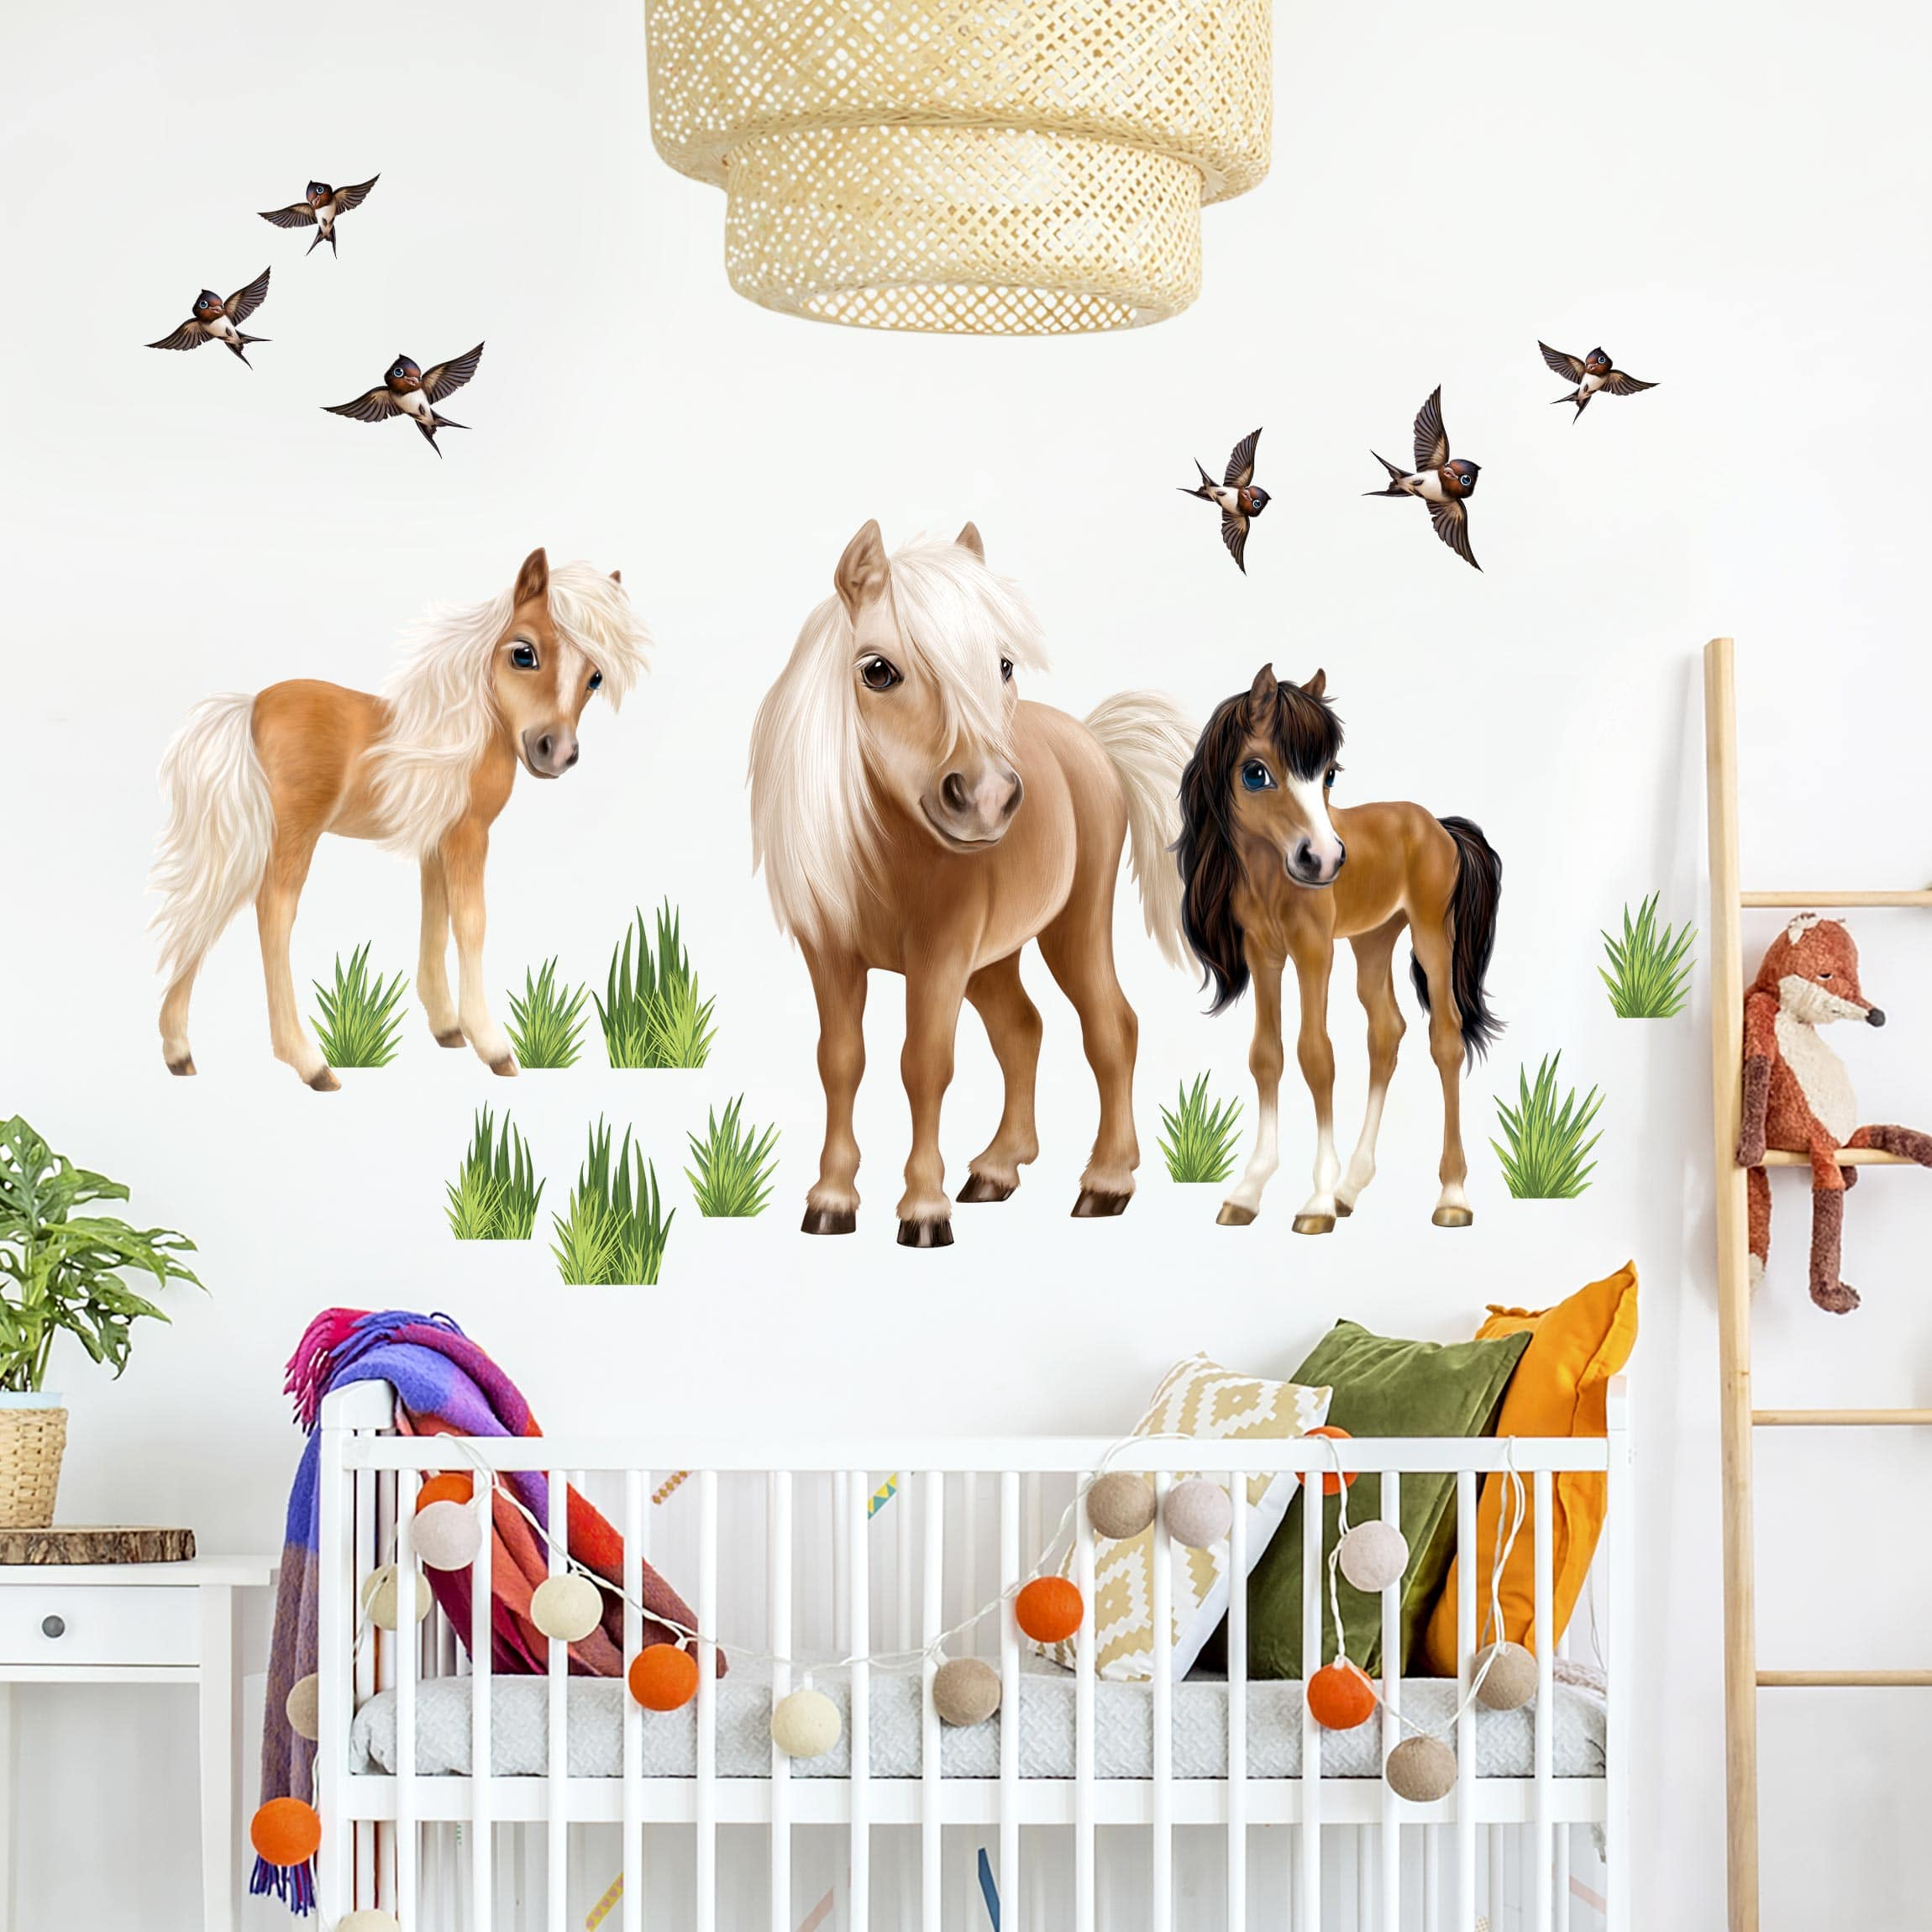 Wandtattoo Kinderzimmer - Animal Club International - Set Pferde